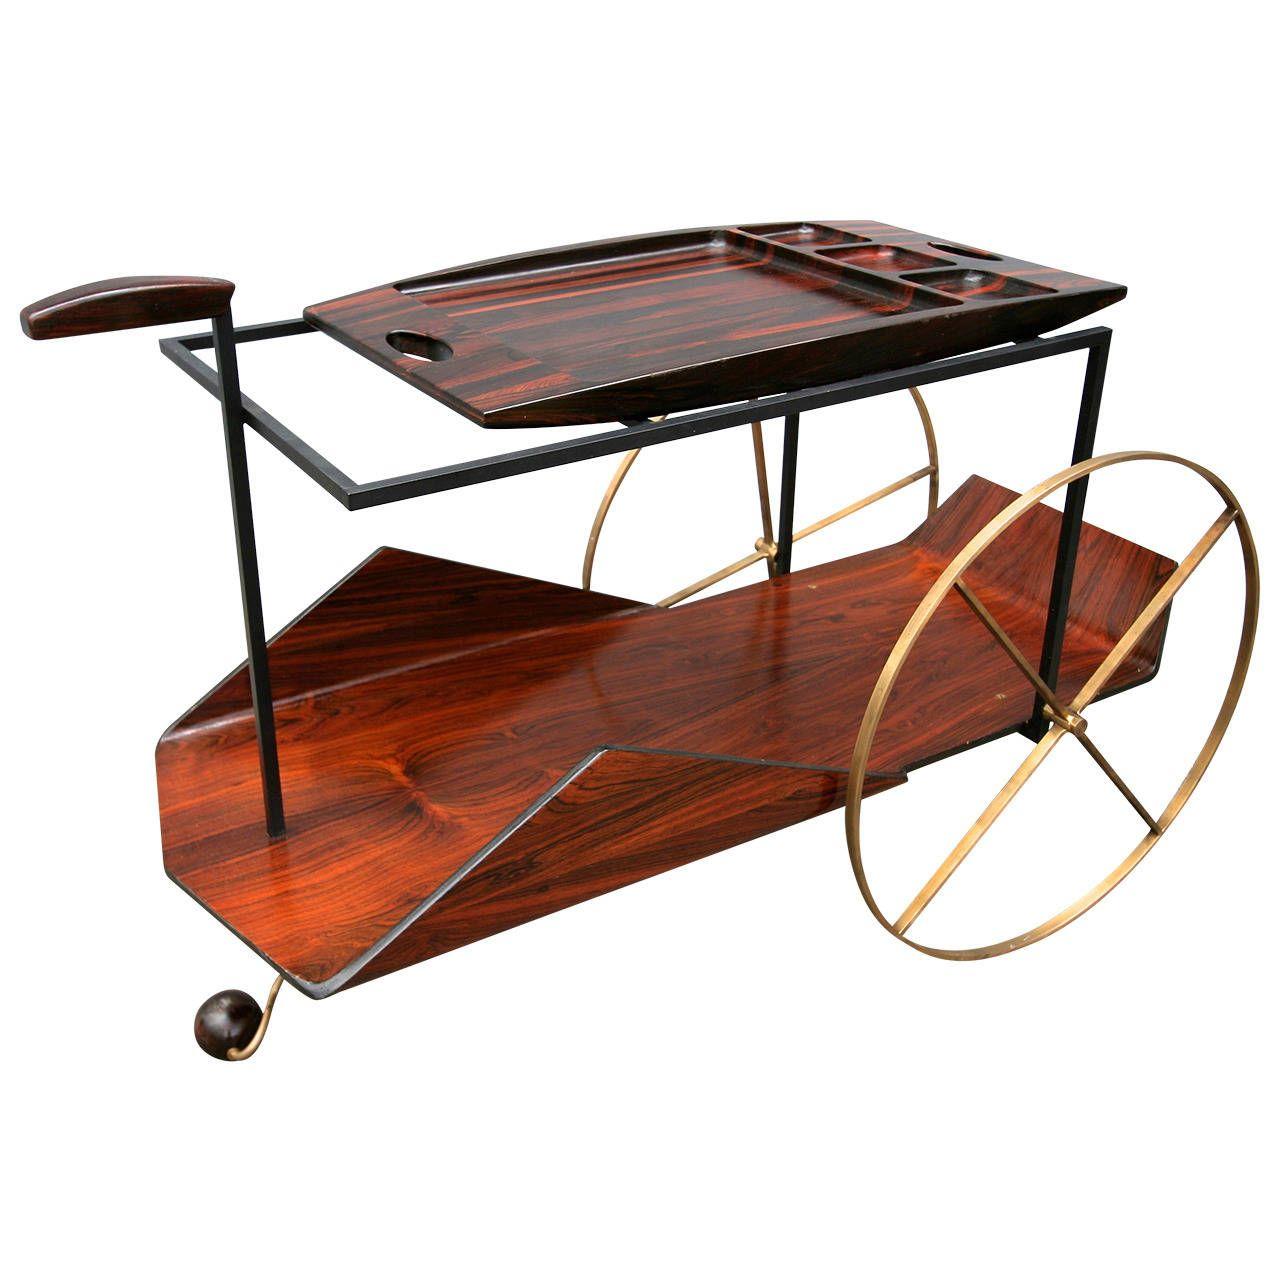 carrinho de cha brazilian tea bar cart by jorge zalszupin from a unique collection